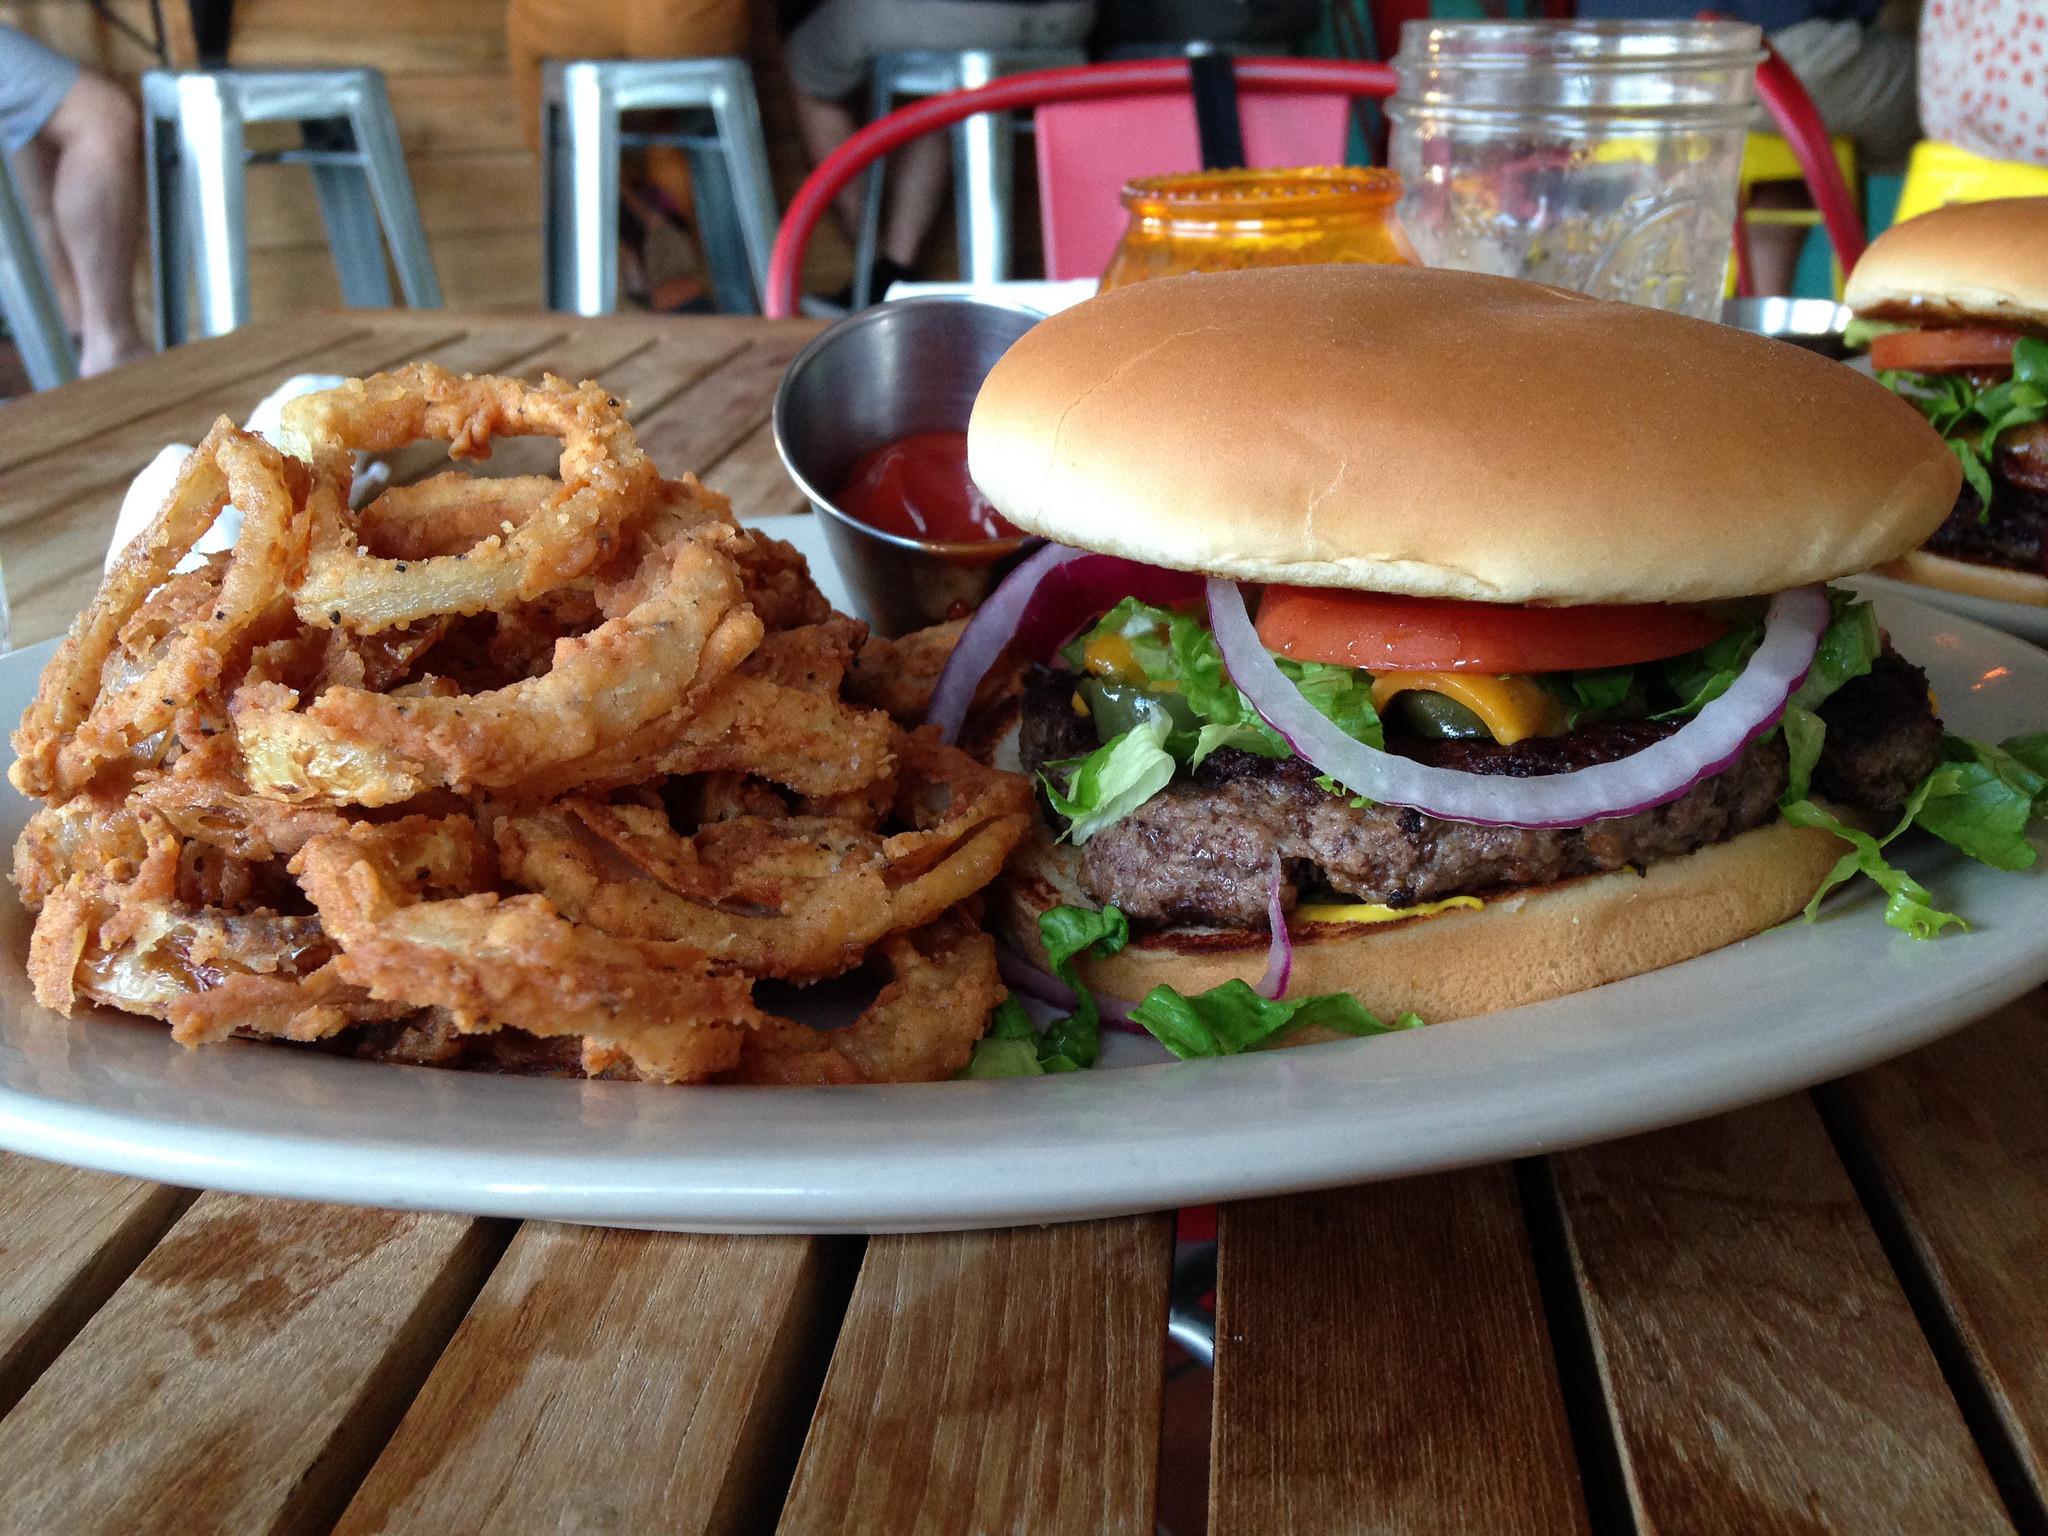 el-sapo-burgers-austin2